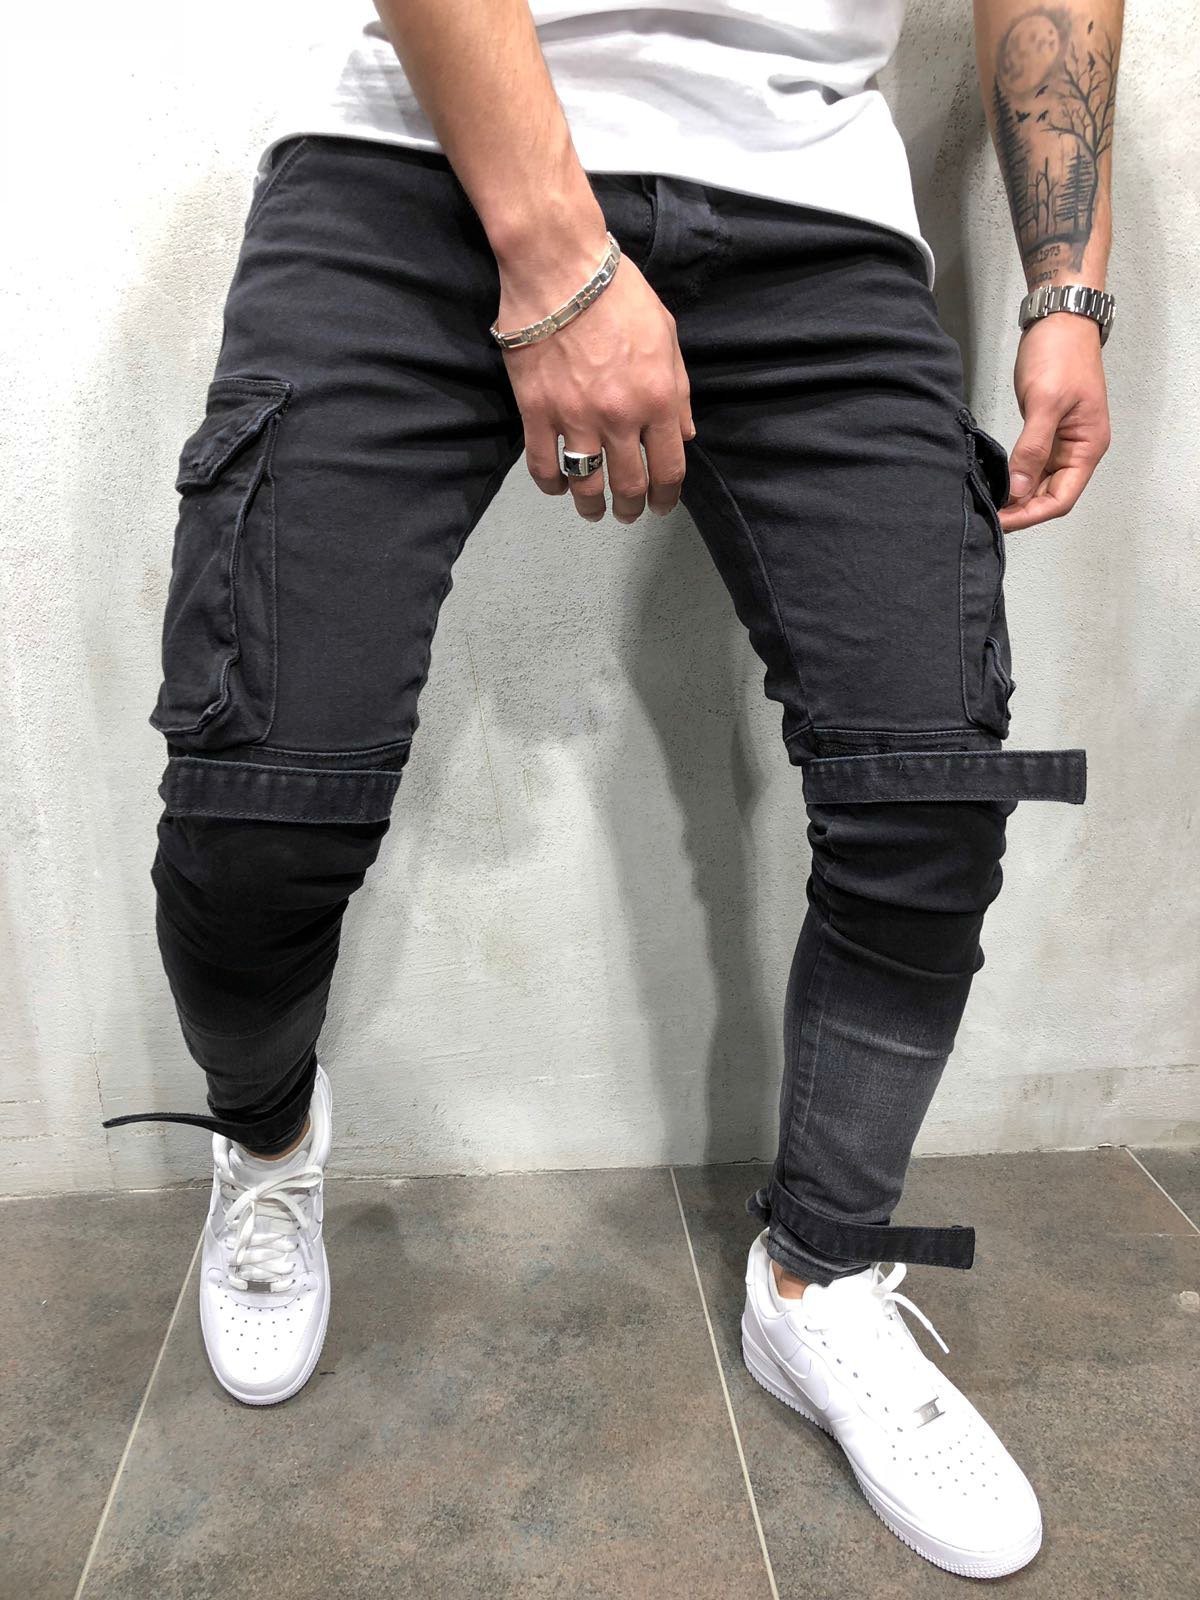 Autumn And Winter New Men'S Slim Fit Jeans Black Large Pocket Casual Hem Men'S Leggings